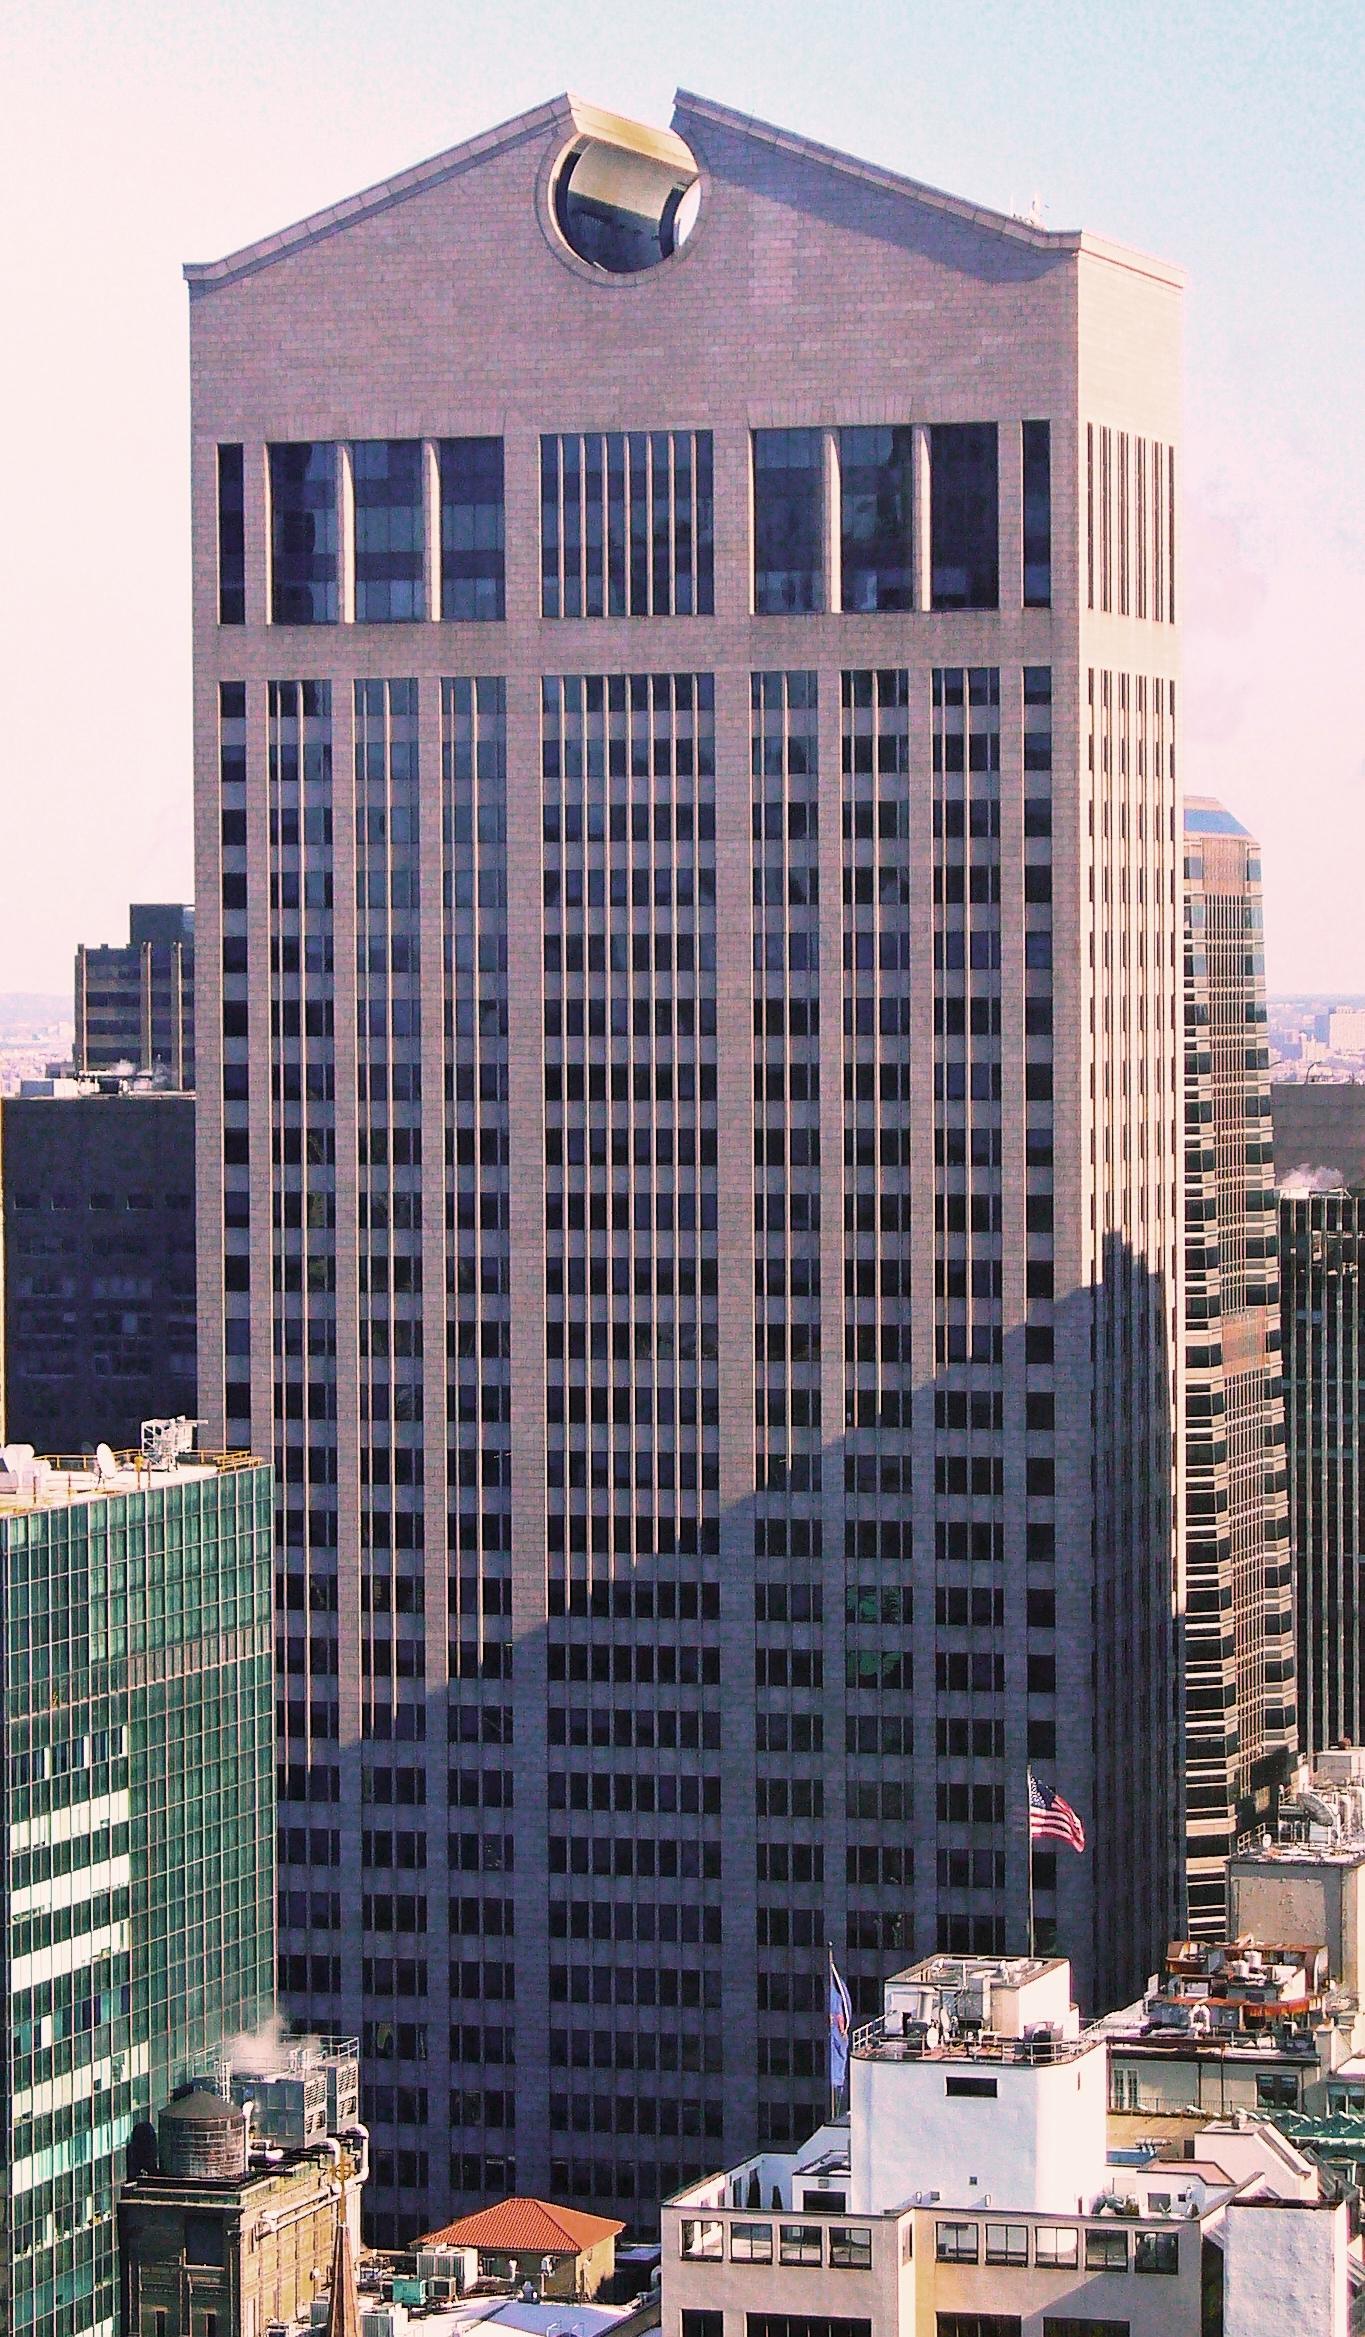 Sony_Building_by_David_Shankbone